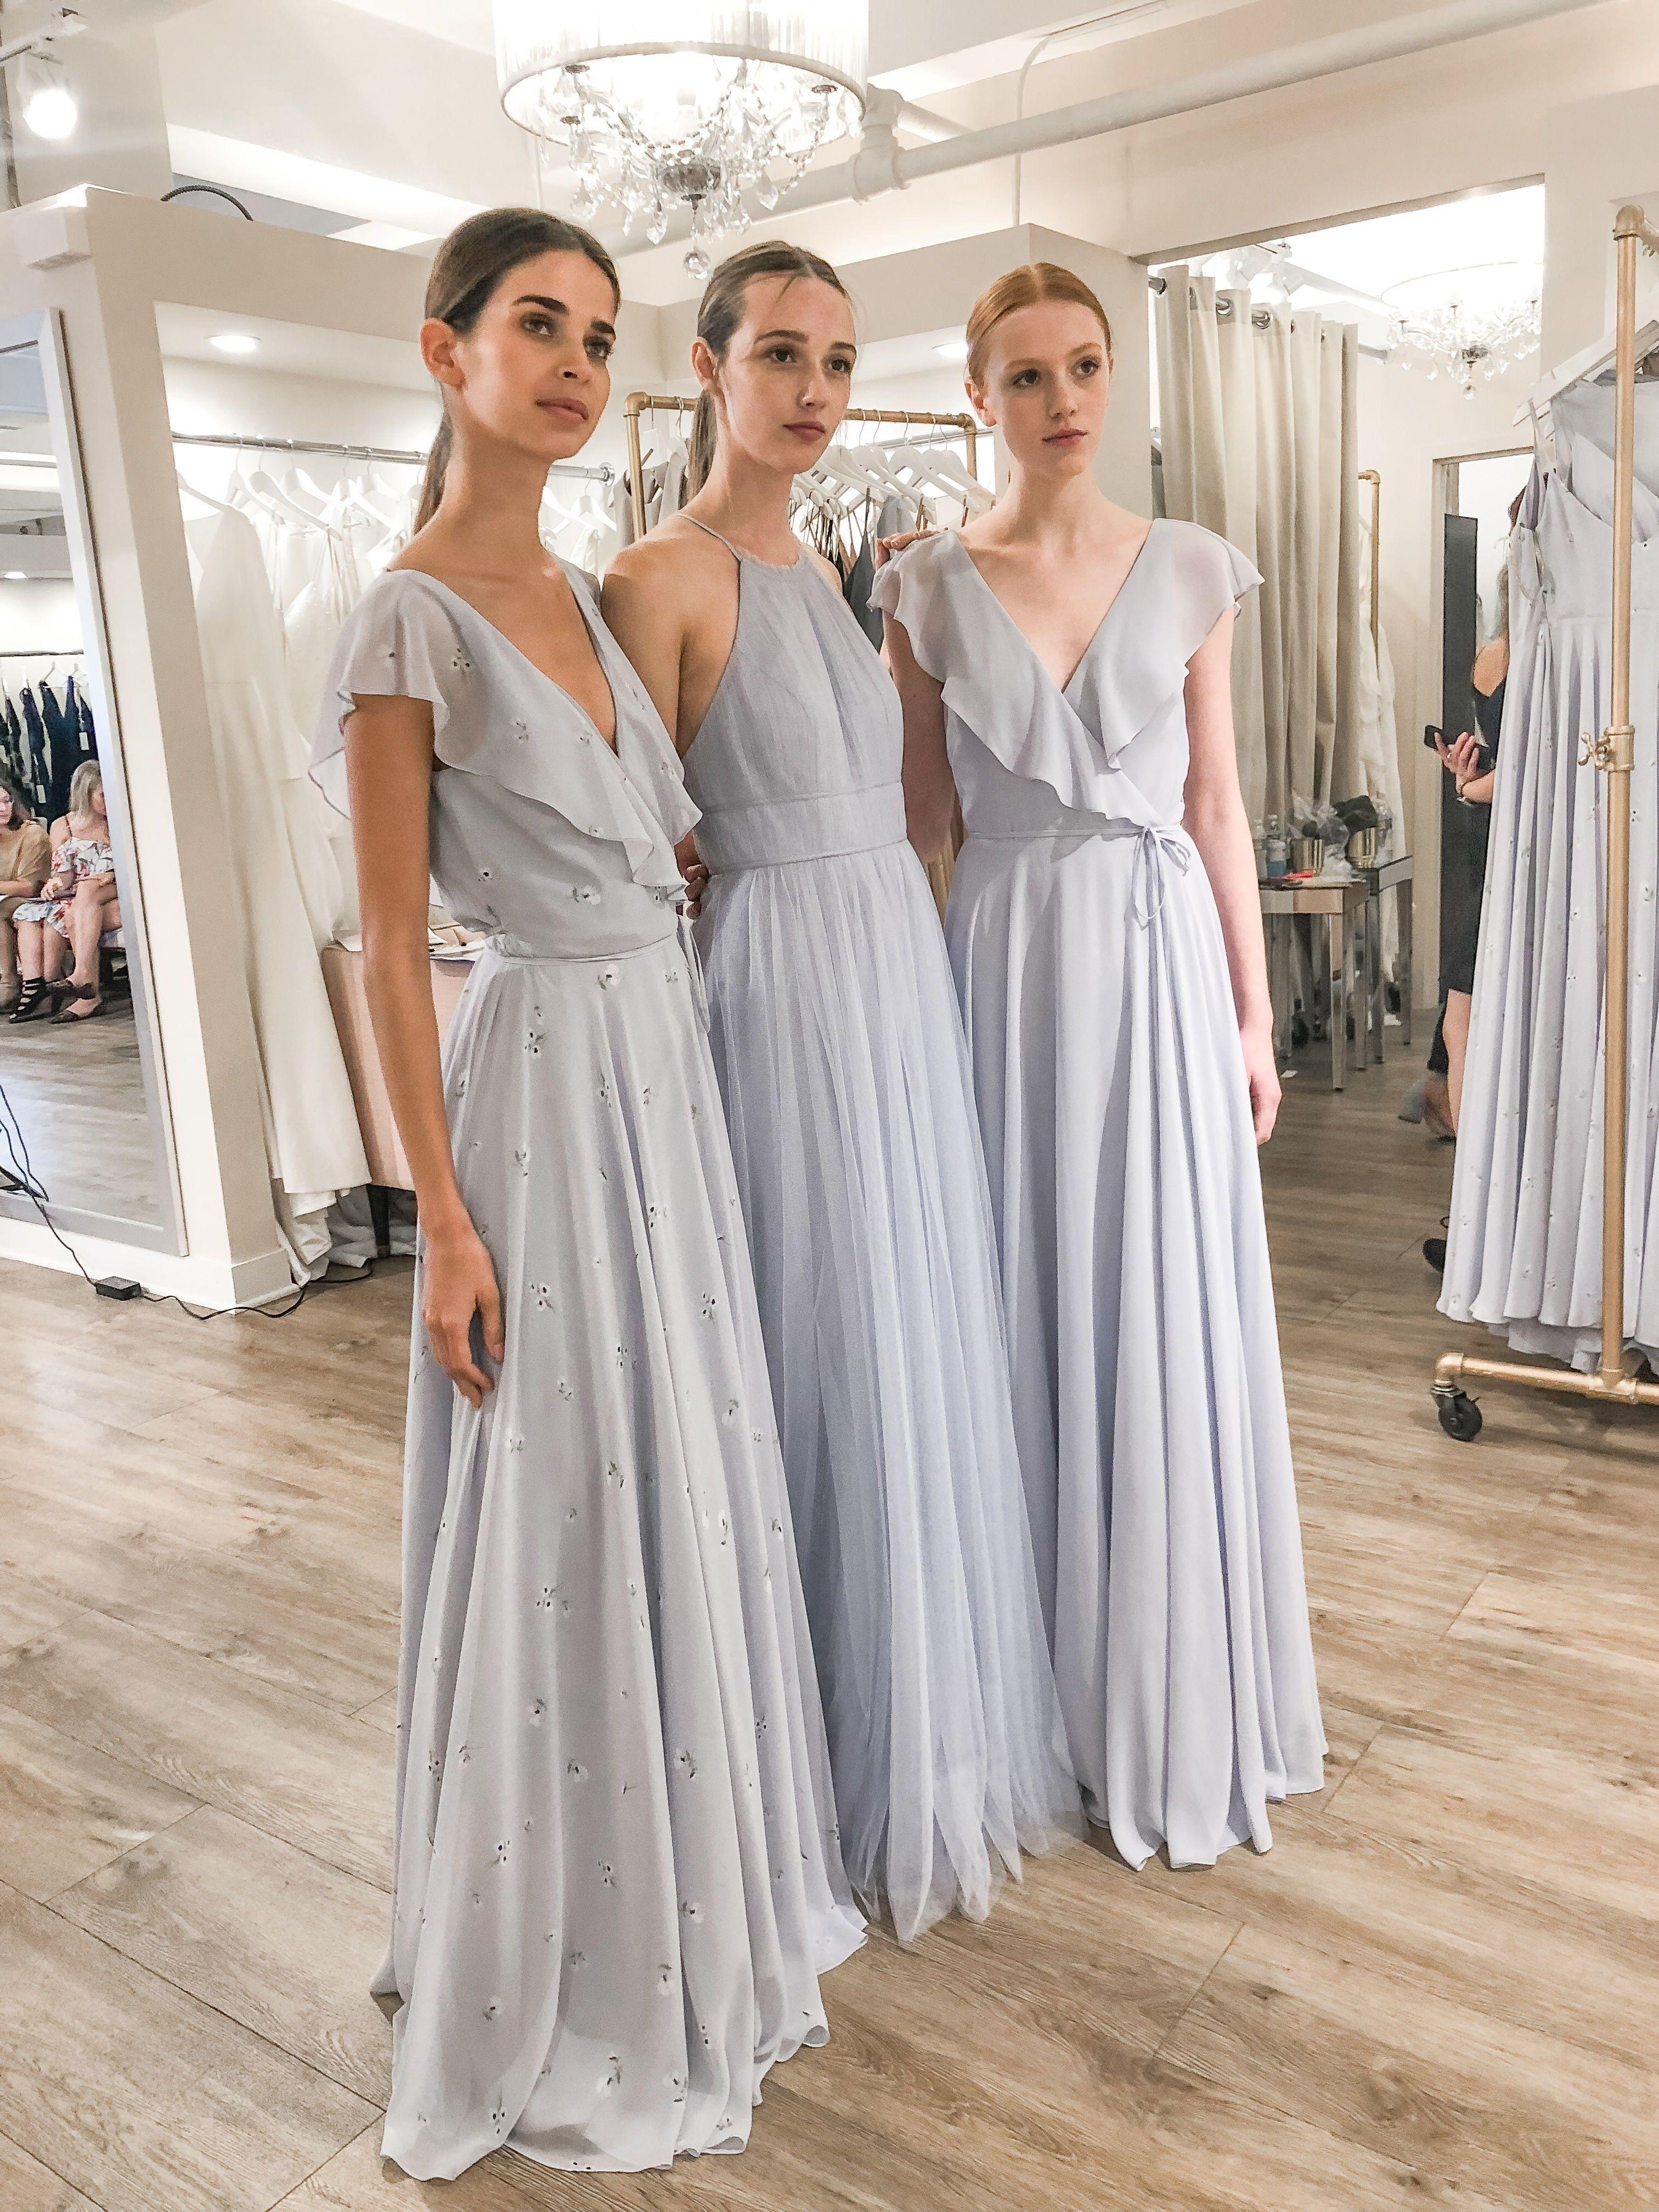 Bridesmaids Dress Trends From New York Bridal Fashion Week Https Rstyle Me Pa3lu5zvesxjgxqq1 Wedding Dresses Blush Blush Bridesmaid Dresses Trending Dresses